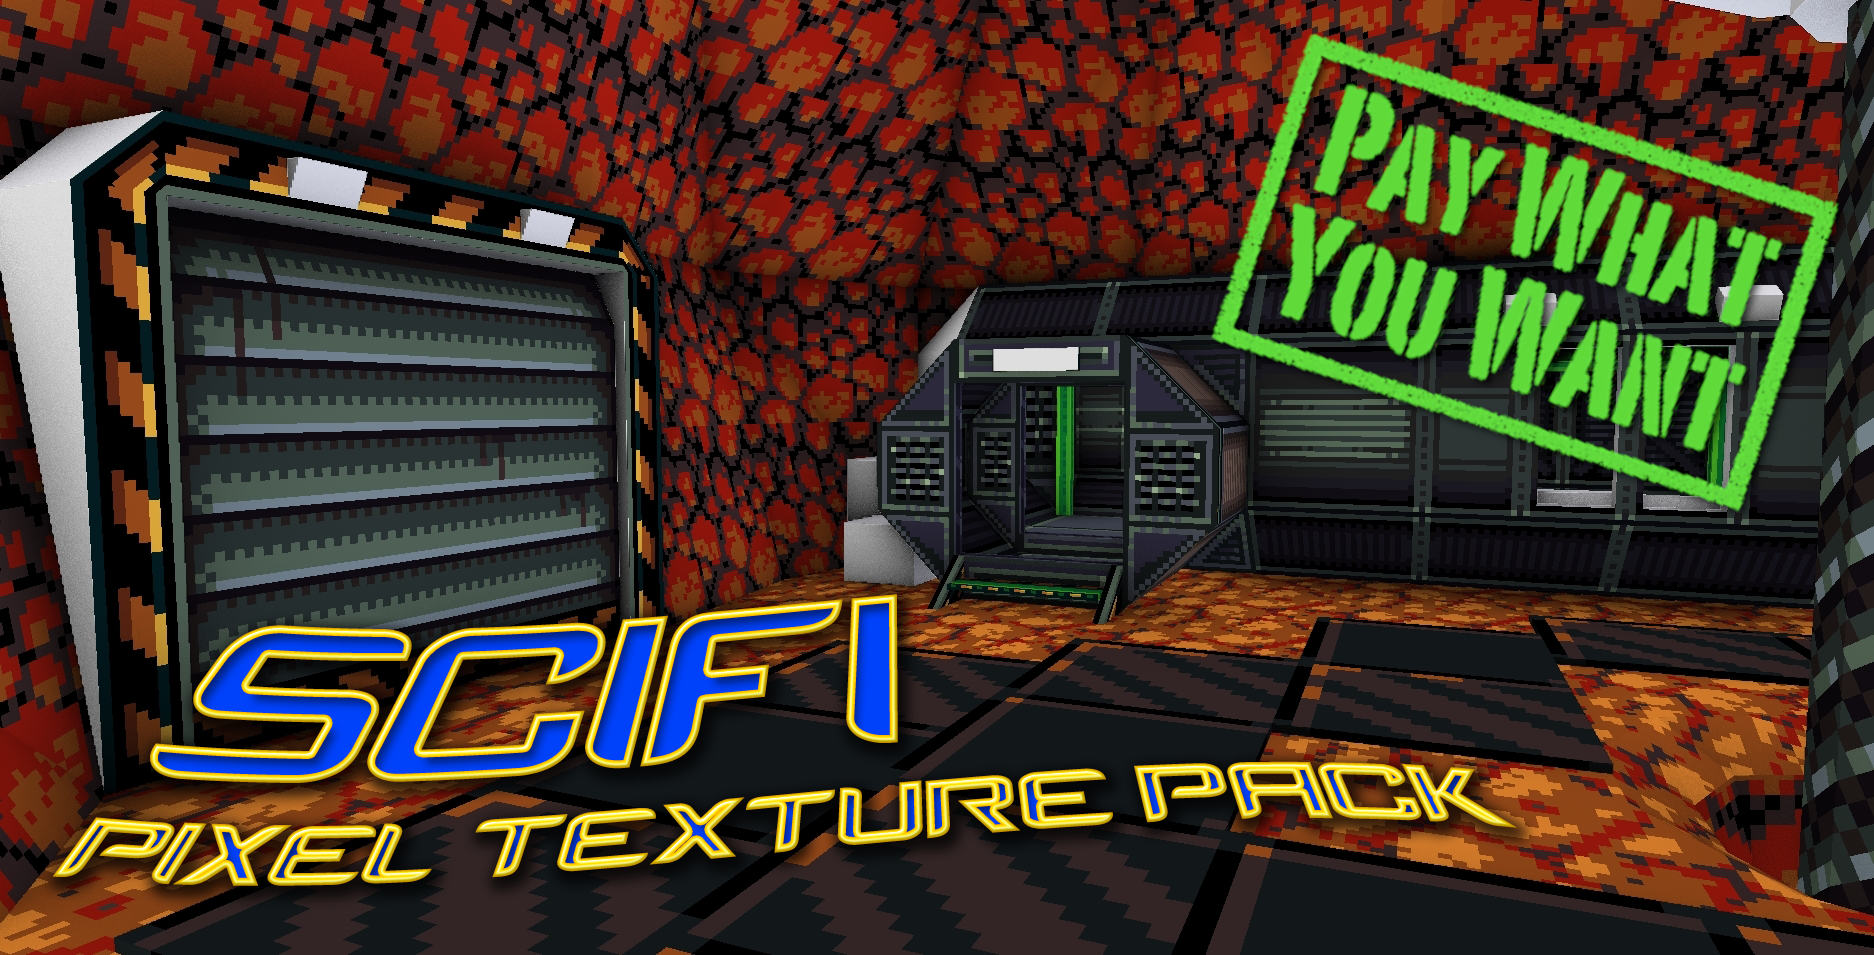 Scifi Pixel Texture Pack